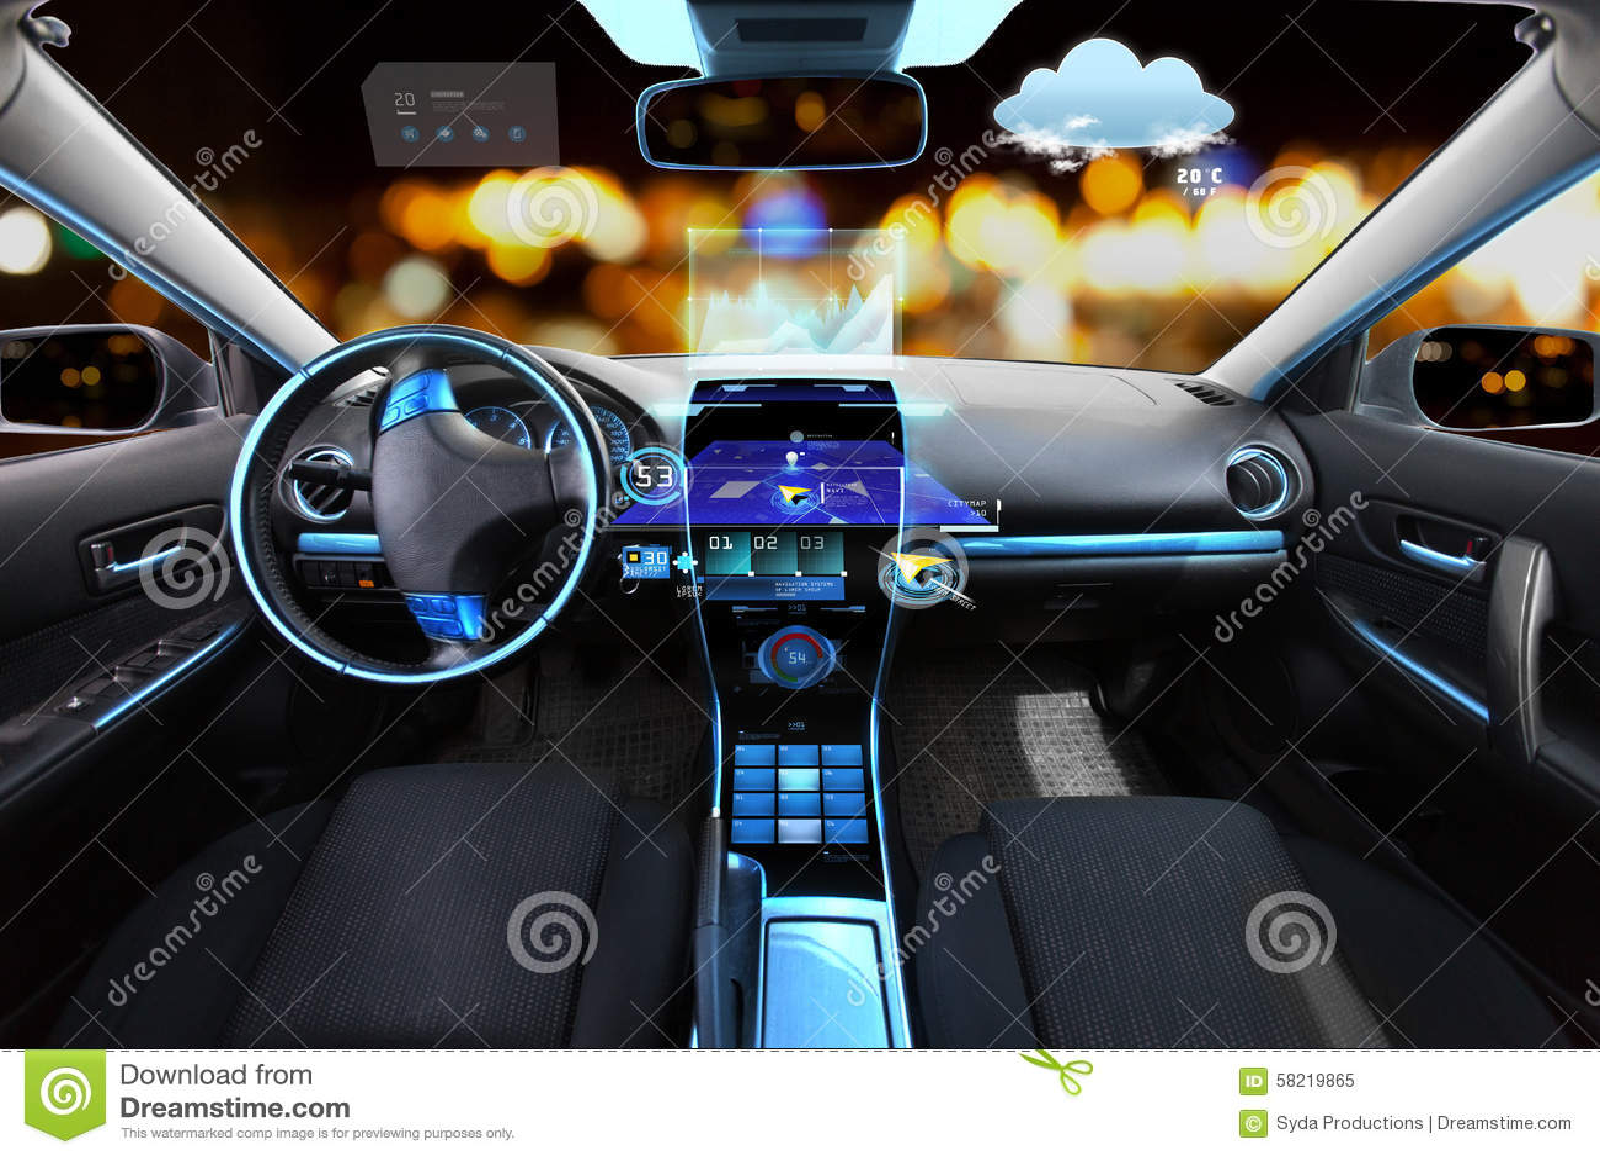 Best Buy Car Satellite Navigation